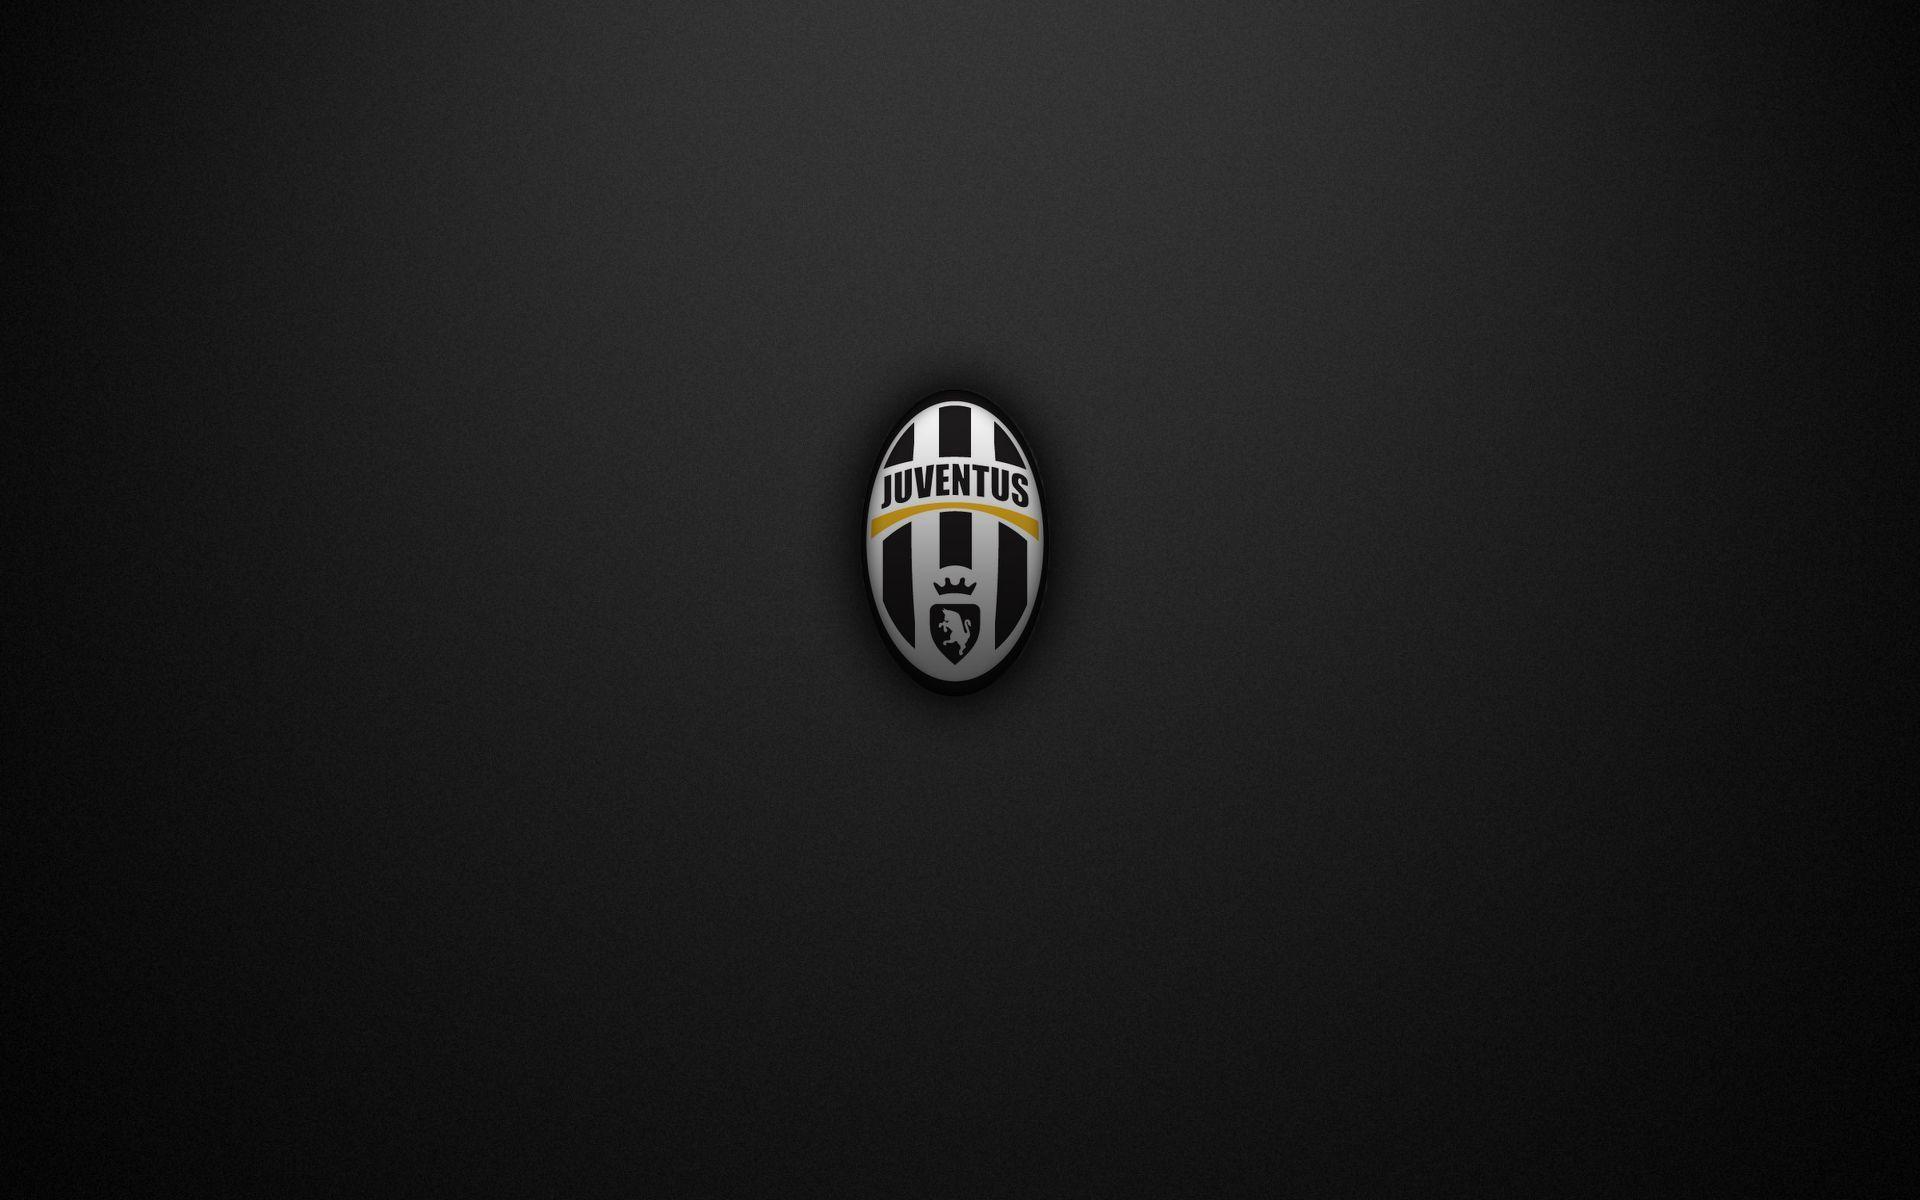 Juventus FC Club Wallpapers HD #11986 Wallpaper | Cool Walldiskpaper.